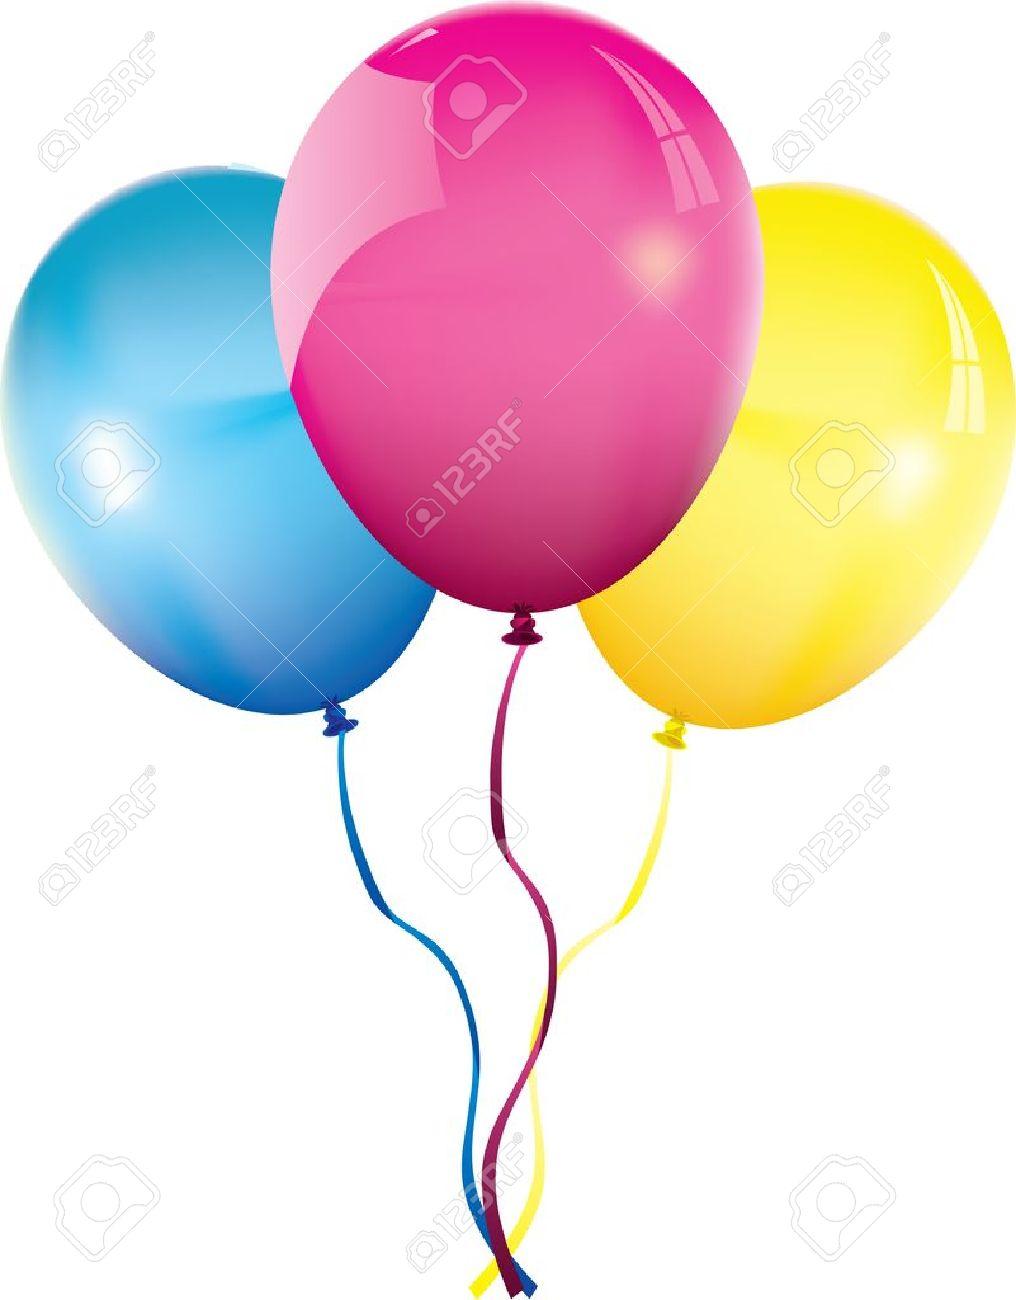 balloons royalty free cliparts vectors and stock illustration rh 123rf com vector balloons font vector balloons illustrator